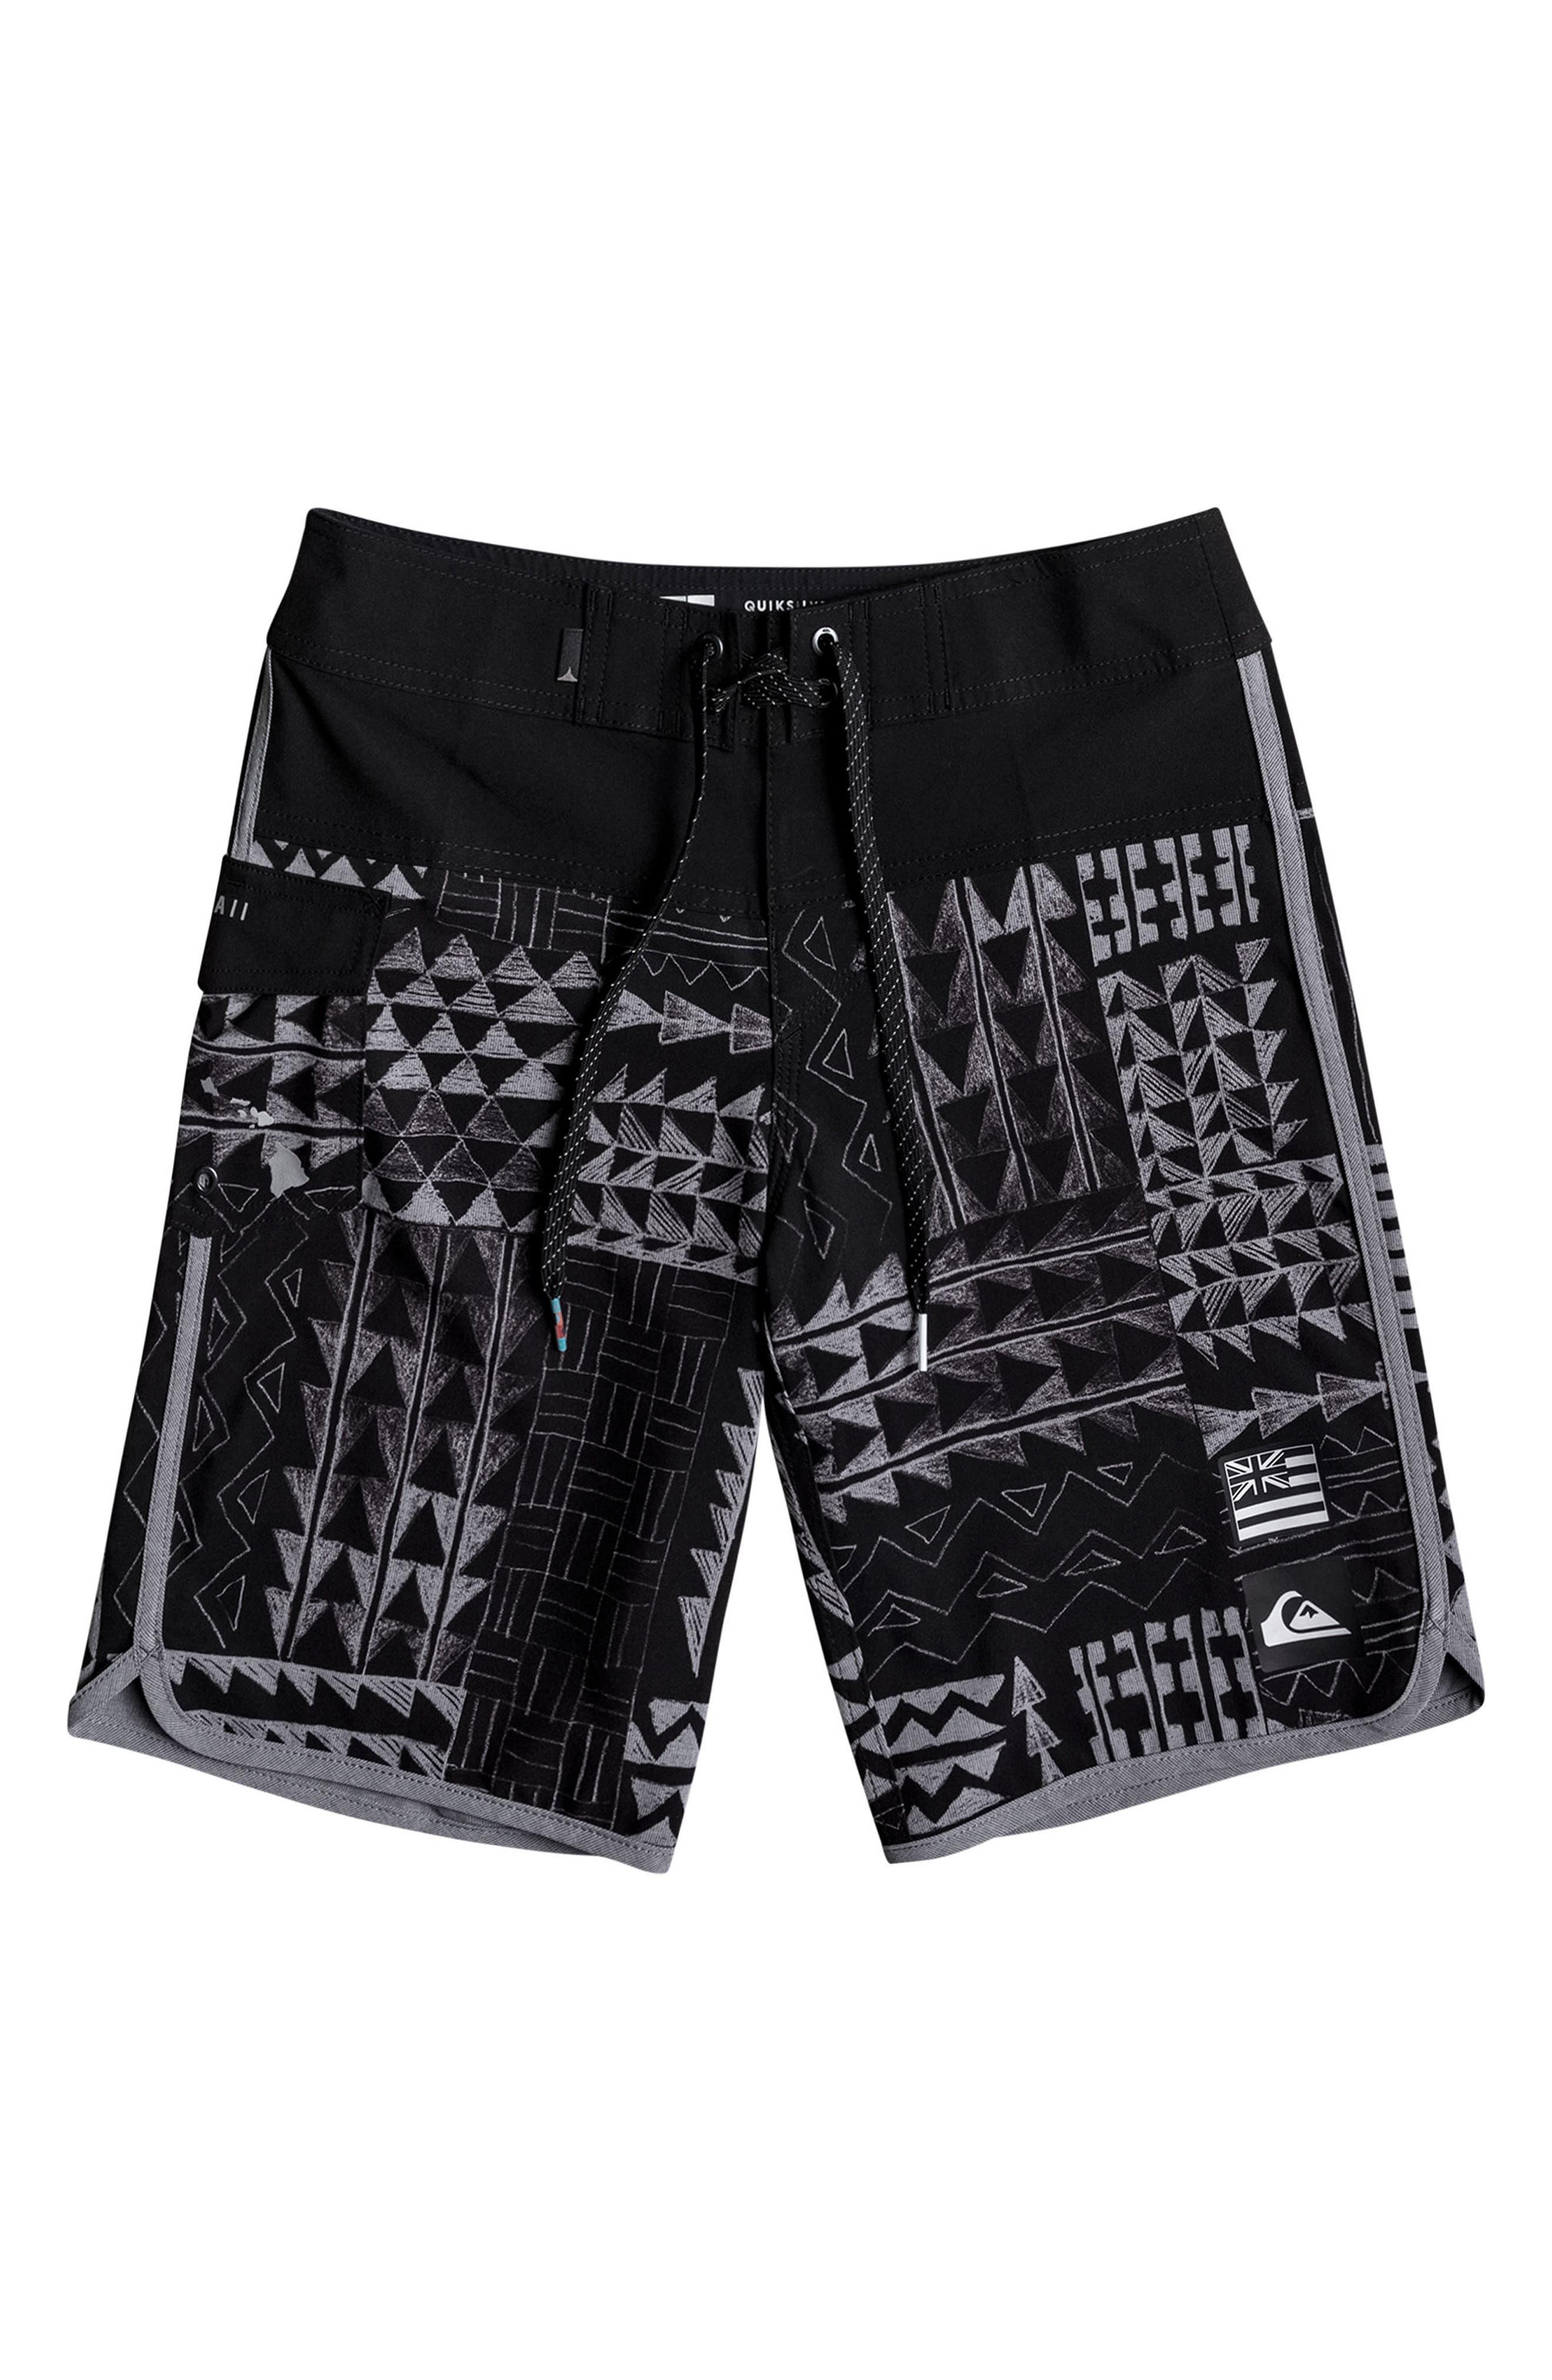 Quiksilver Hawaii Scallop Board Shorts (Big Boys)